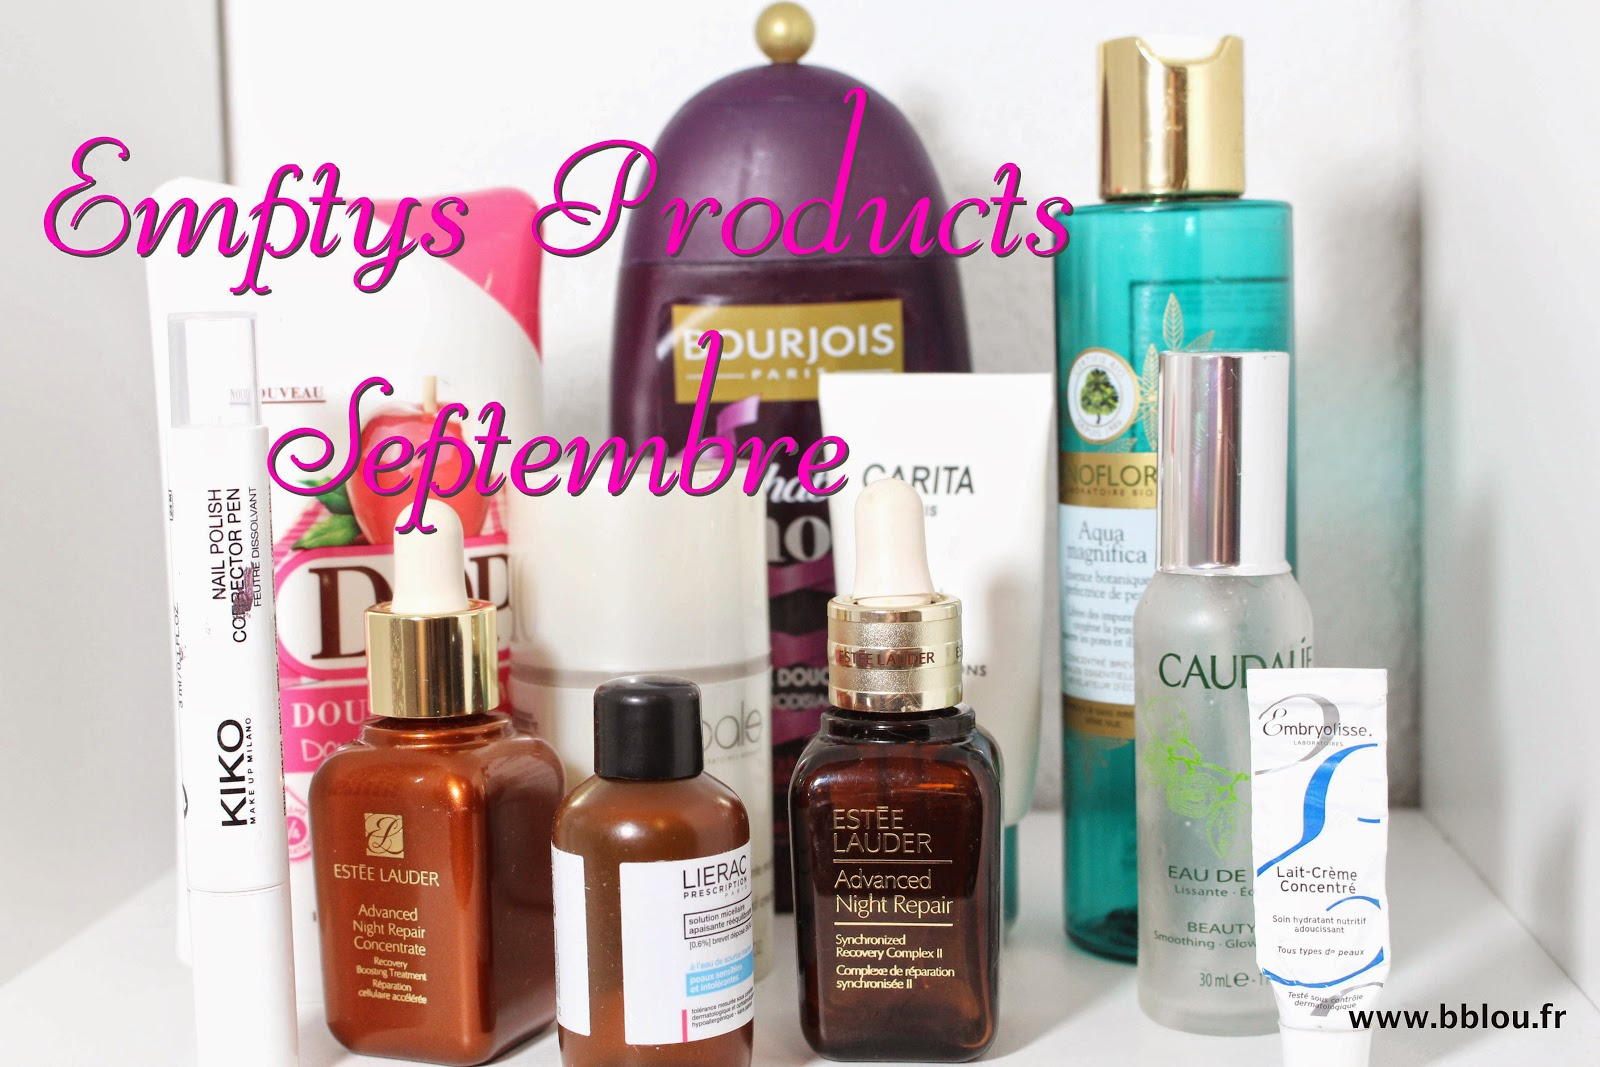 http://www.beautybylou.com/2014/09/ils-quittent-ma-salle-de-bain-8.html